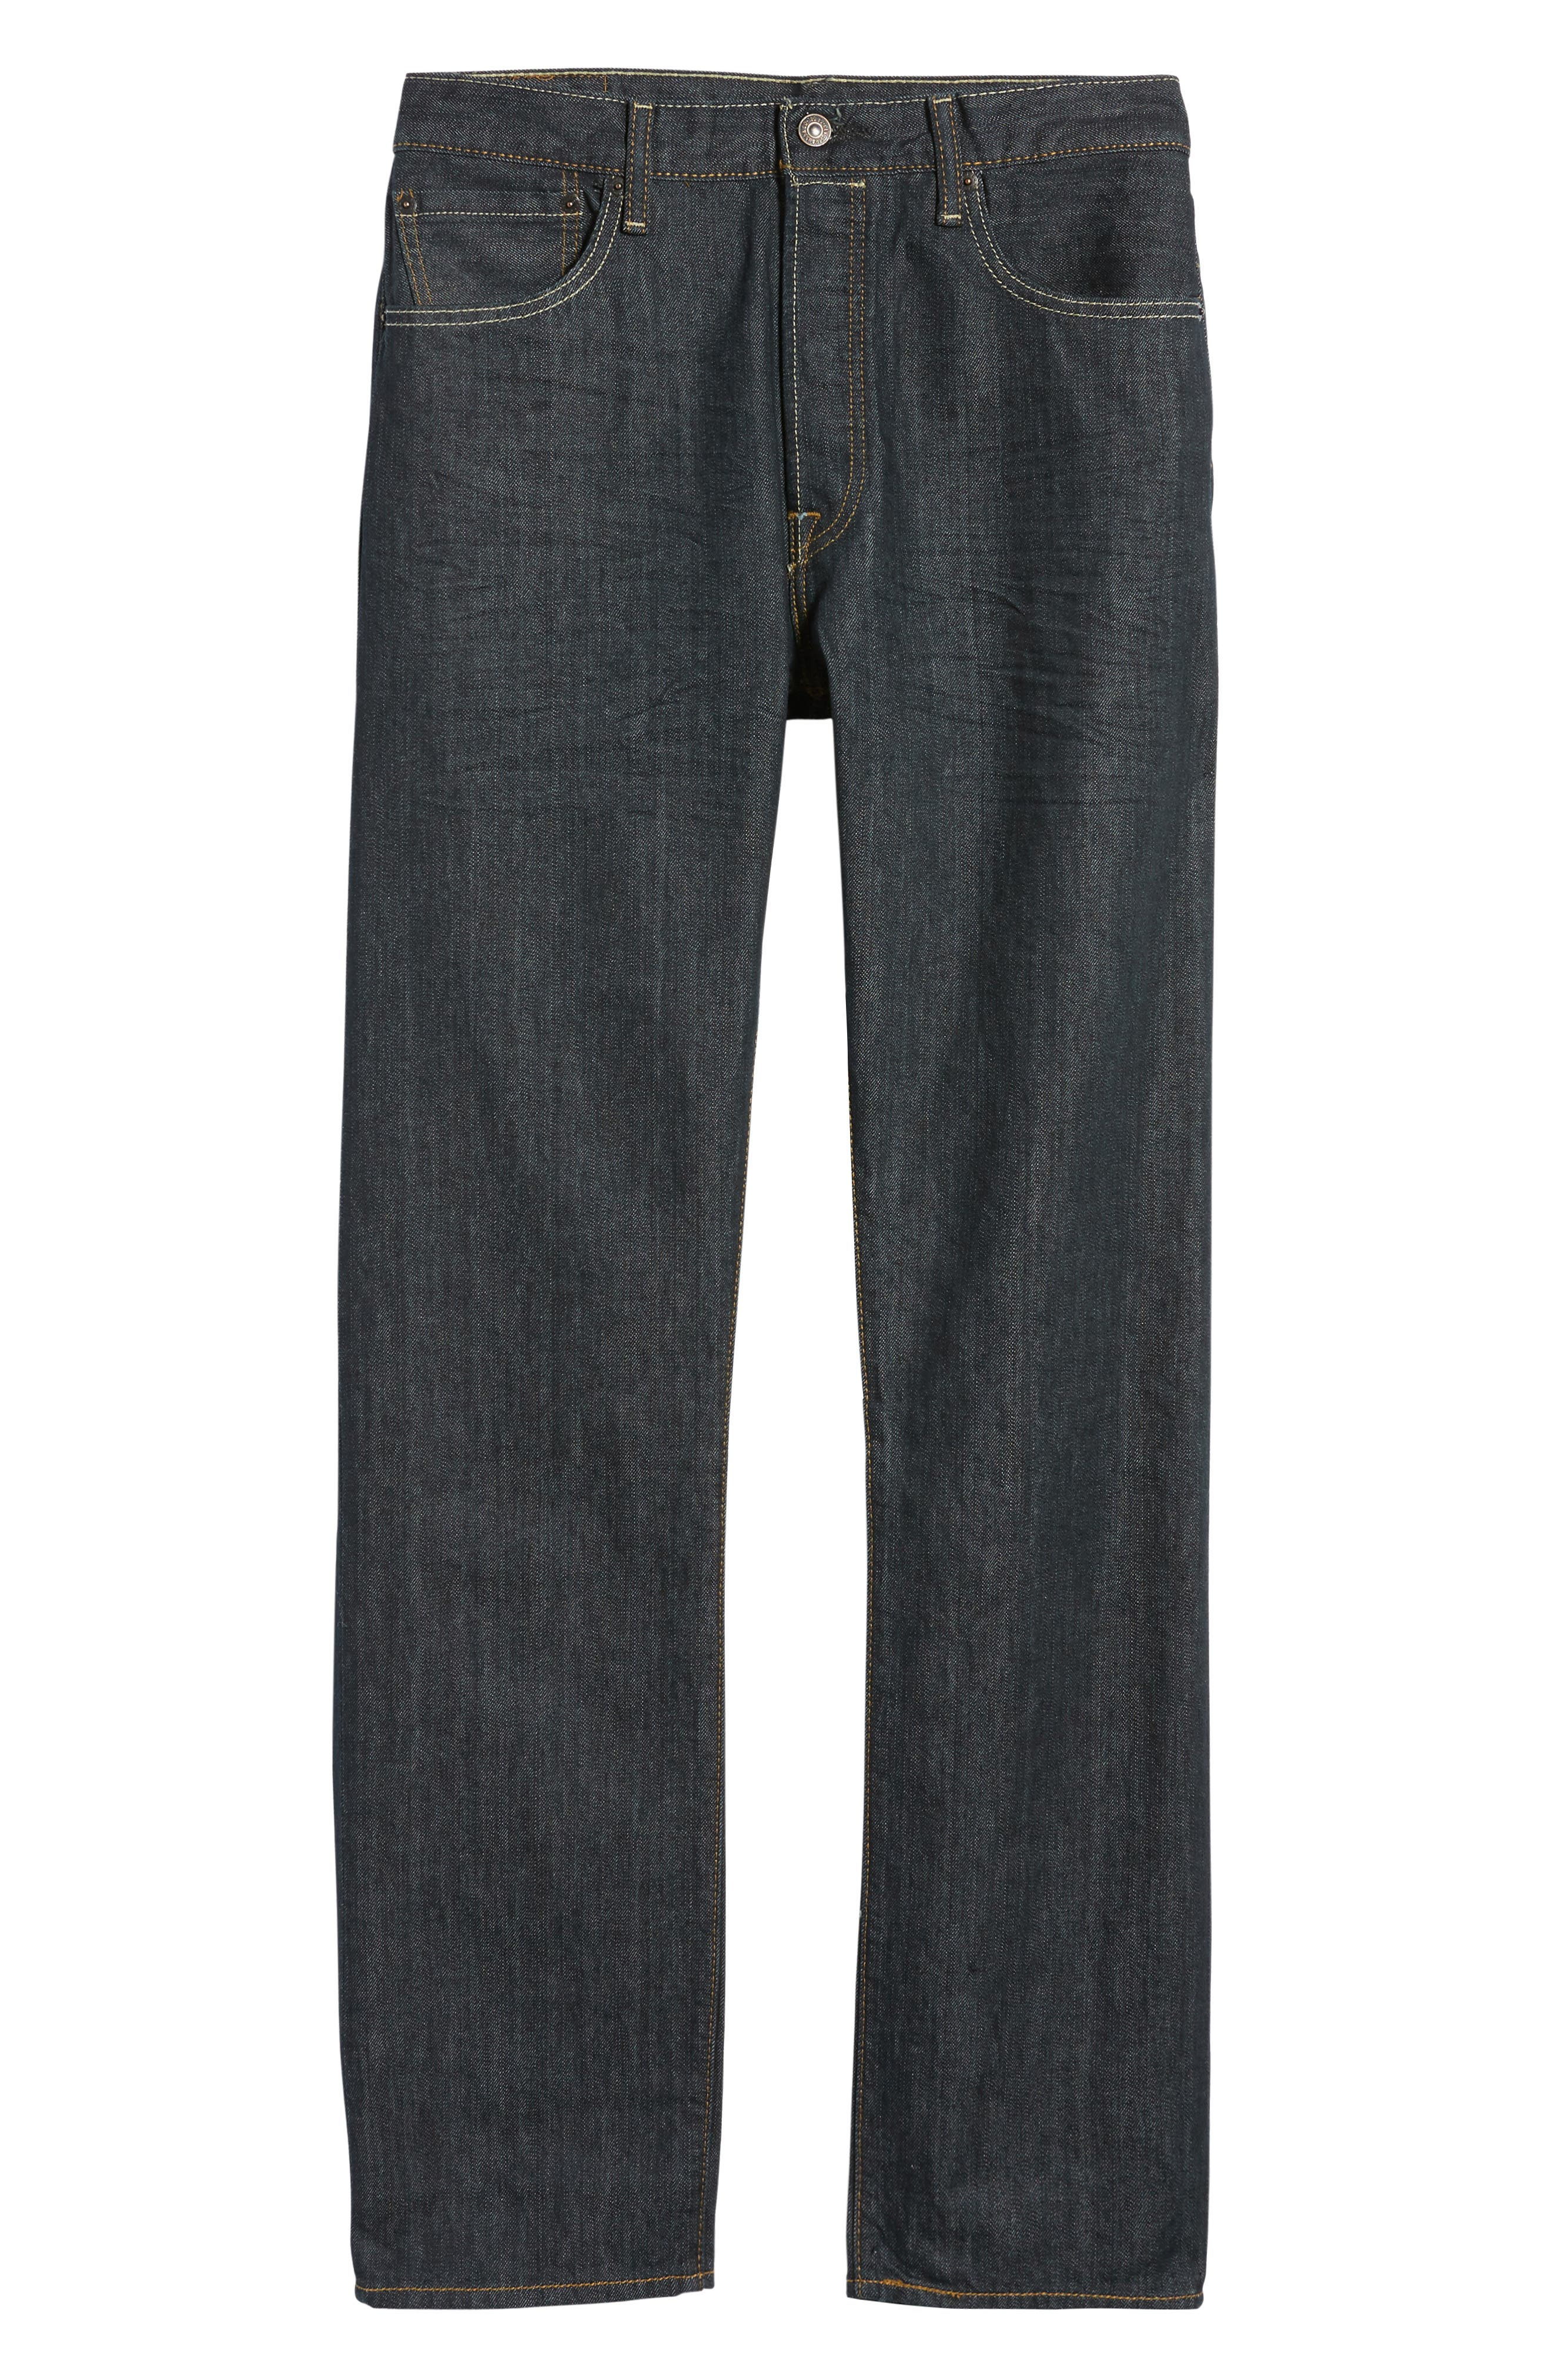 Men's Levi's 501 Straight Leg Jeans,  29 x 32 - Blue